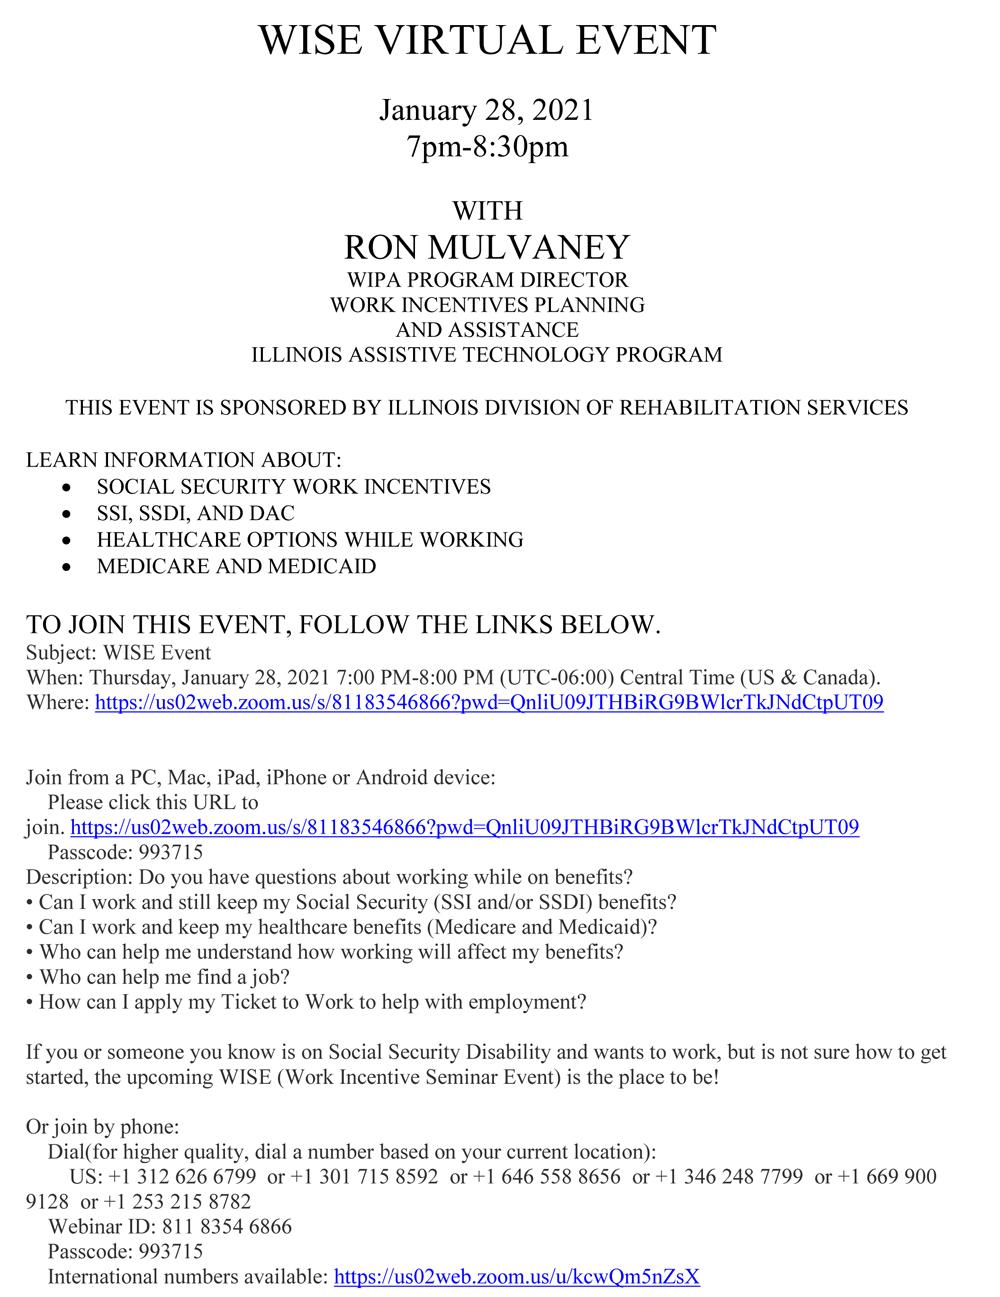 Wise Virtual Event - Work Incentive Seminar Event